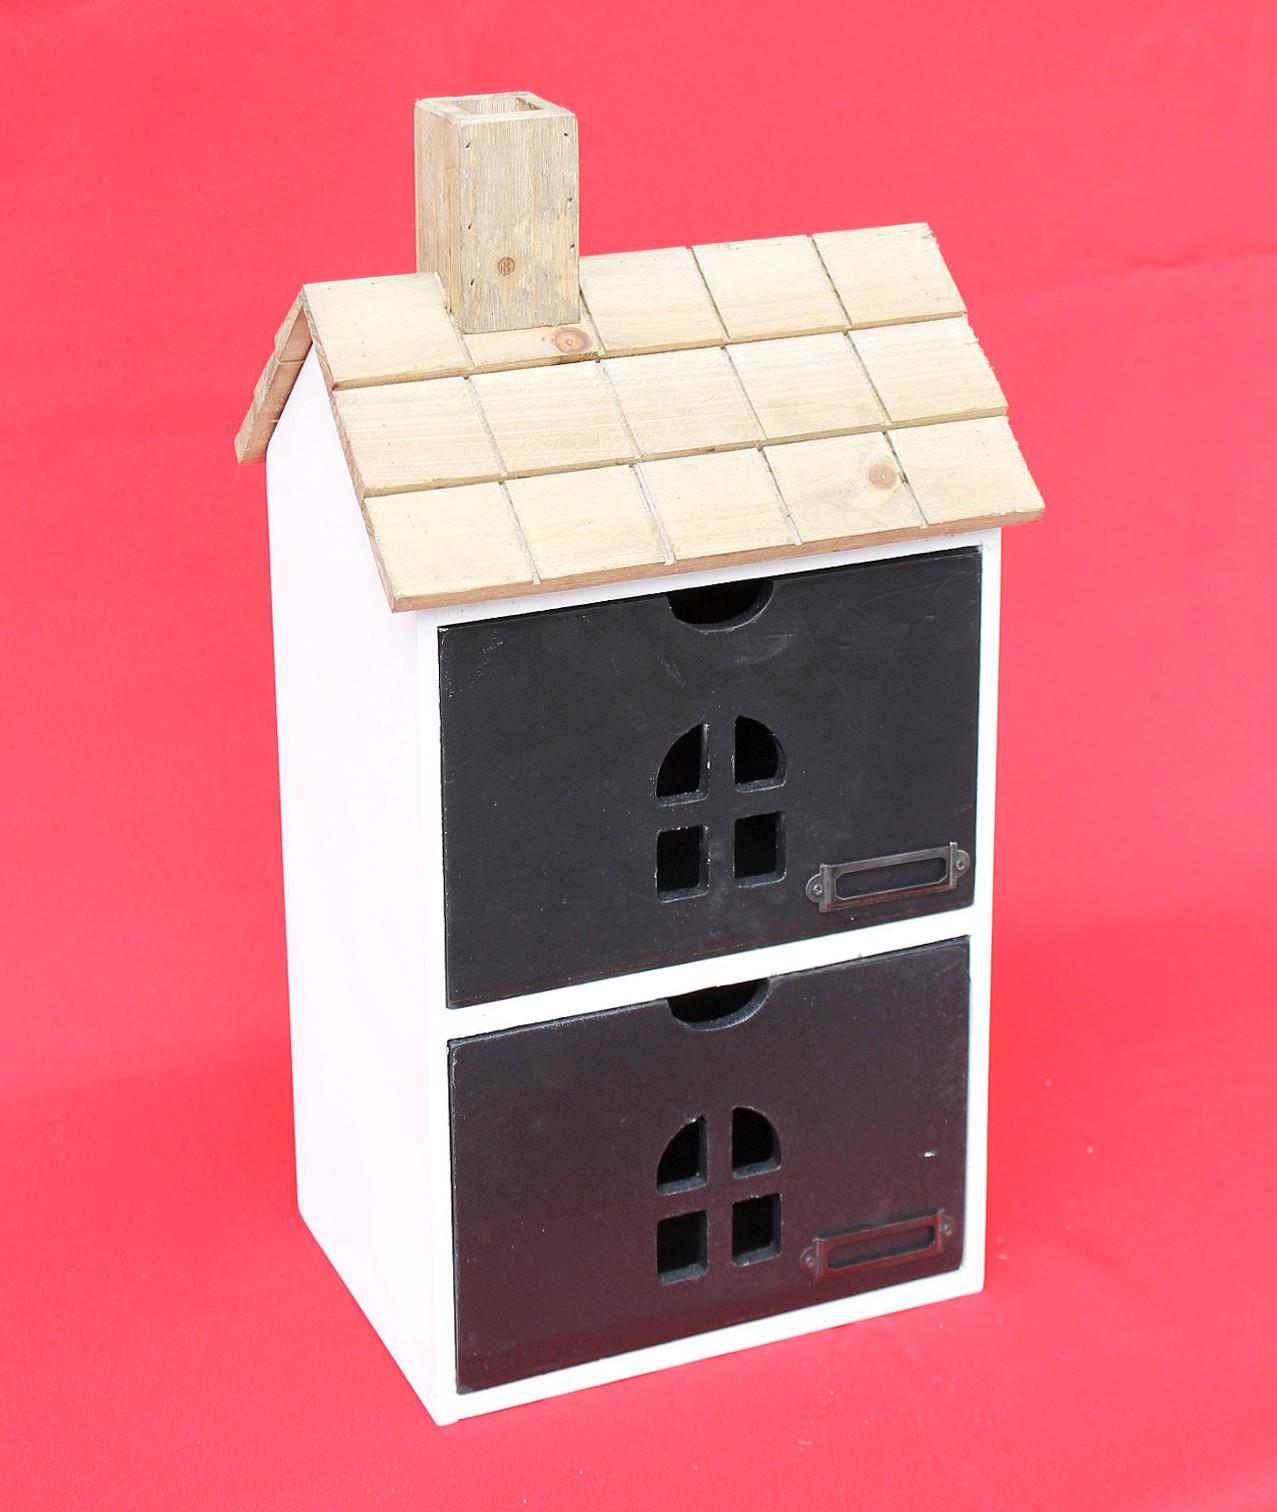 minikommode haus kommode 14b407 schrank mit 2 schubladen 43cm ordner k chenregal dandibo. Black Bedroom Furniture Sets. Home Design Ideas